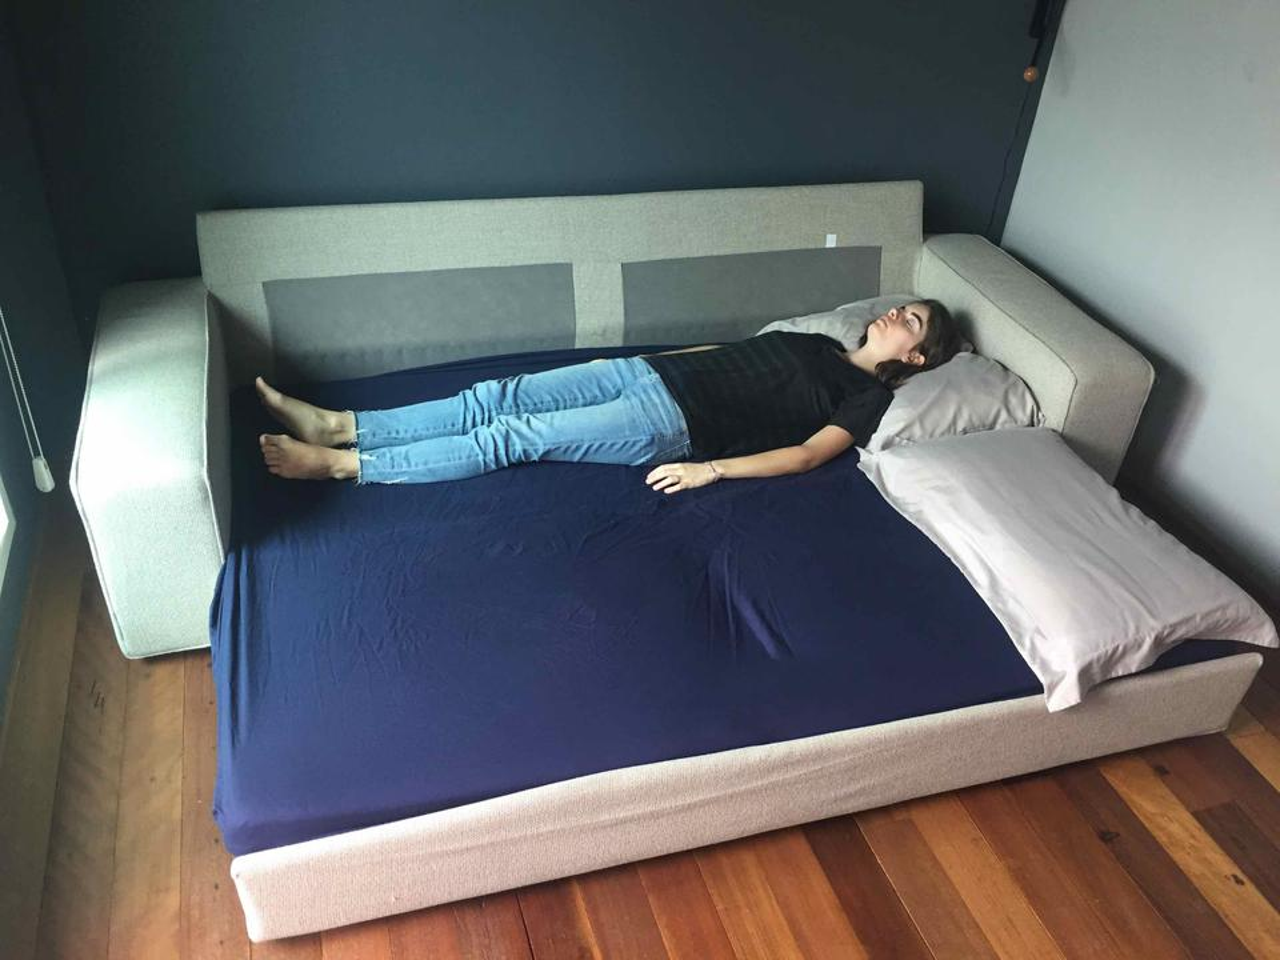 Sofa Bed Ikea 3 Seats รุ่น KIVIK รูปที่ 5